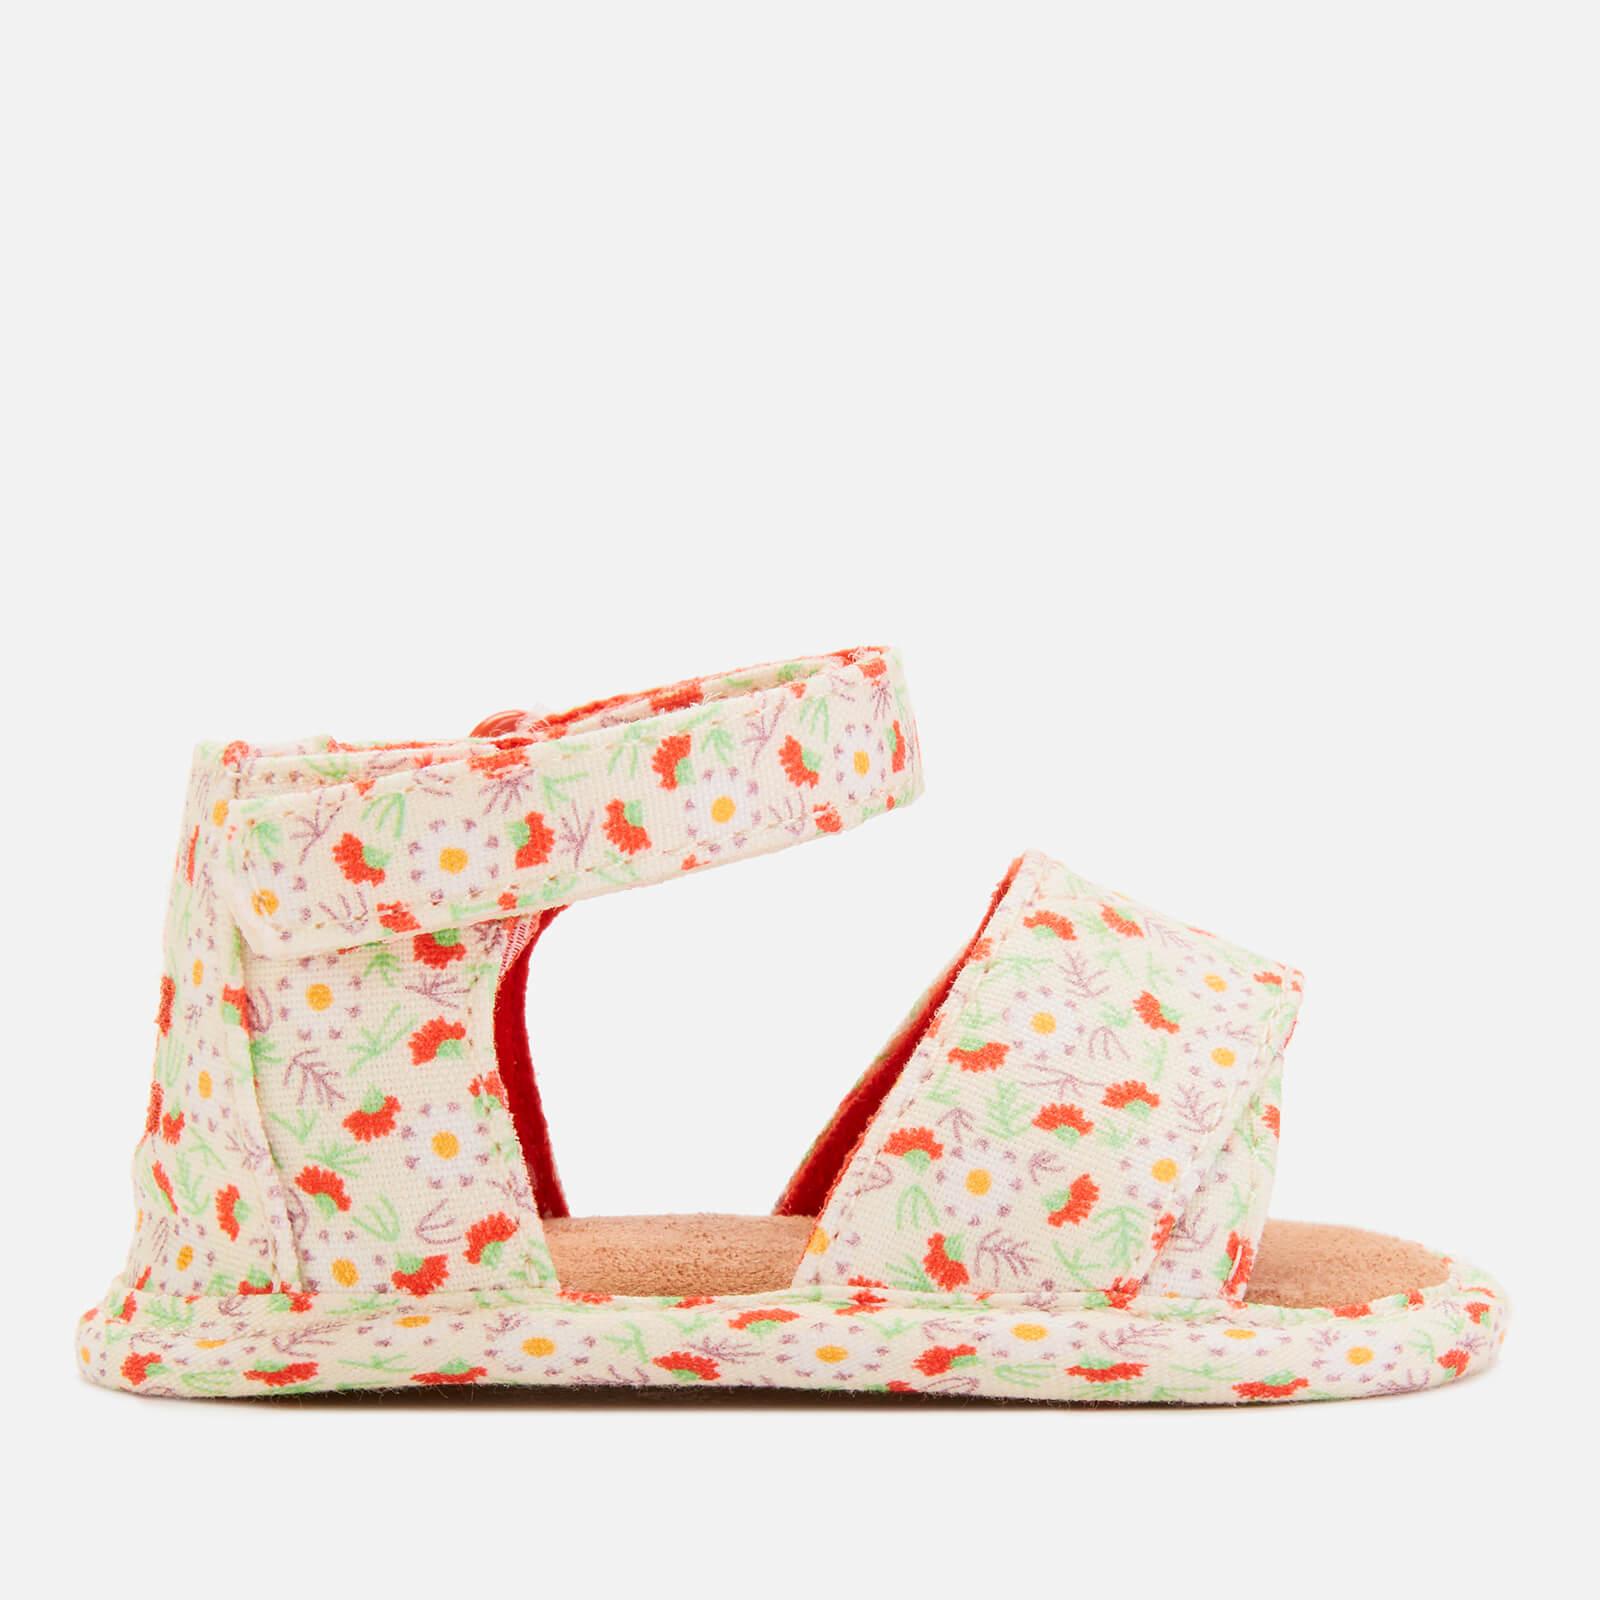 TOMS Babie's Shiloh Sandals - Floral - UK 0.5 Baby - Multi